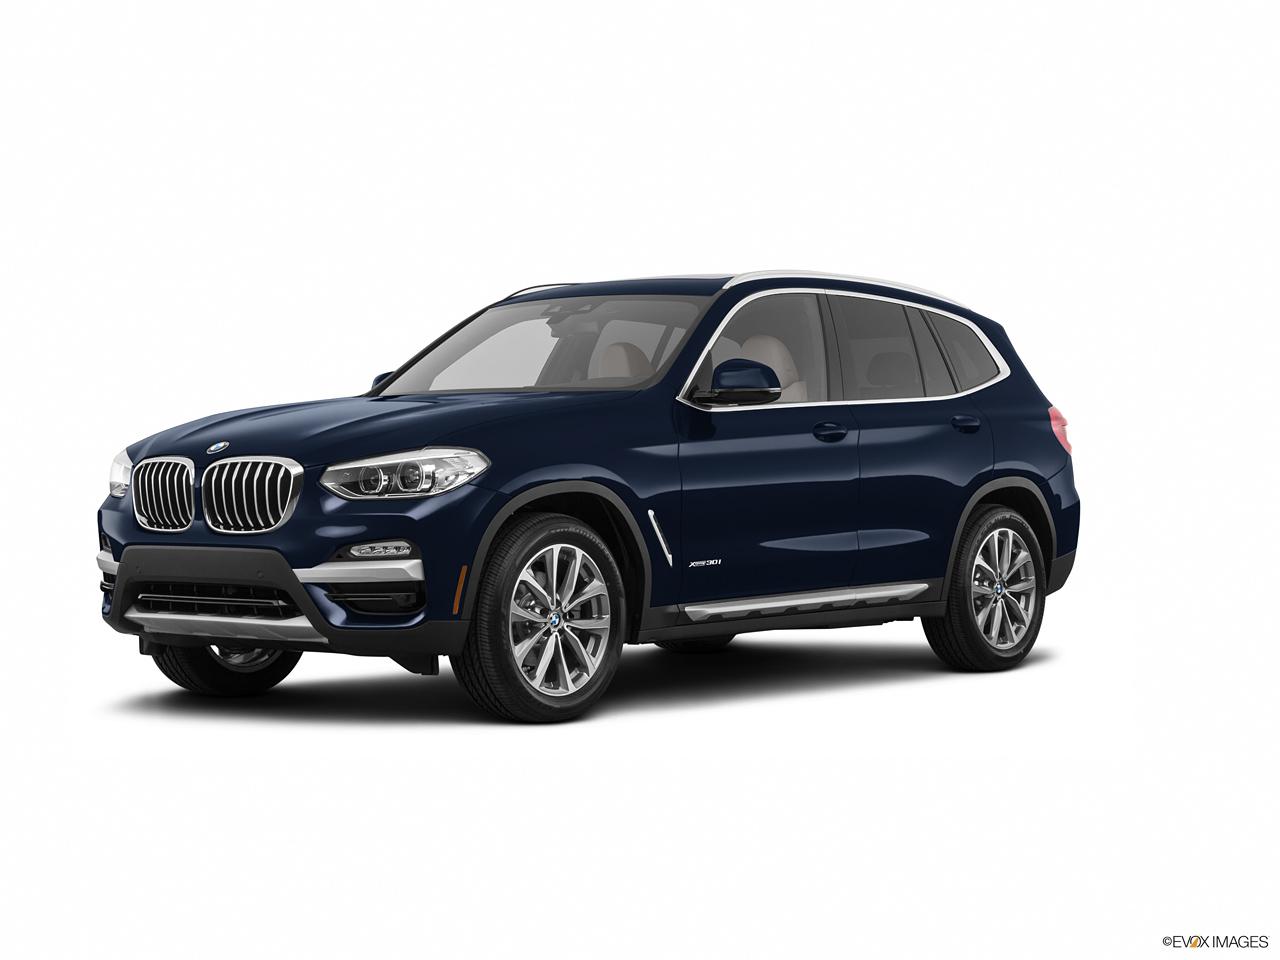 car pictures list for bmw x3 2018 xdrive 28i kuwait yallamotor. Black Bedroom Furniture Sets. Home Design Ideas